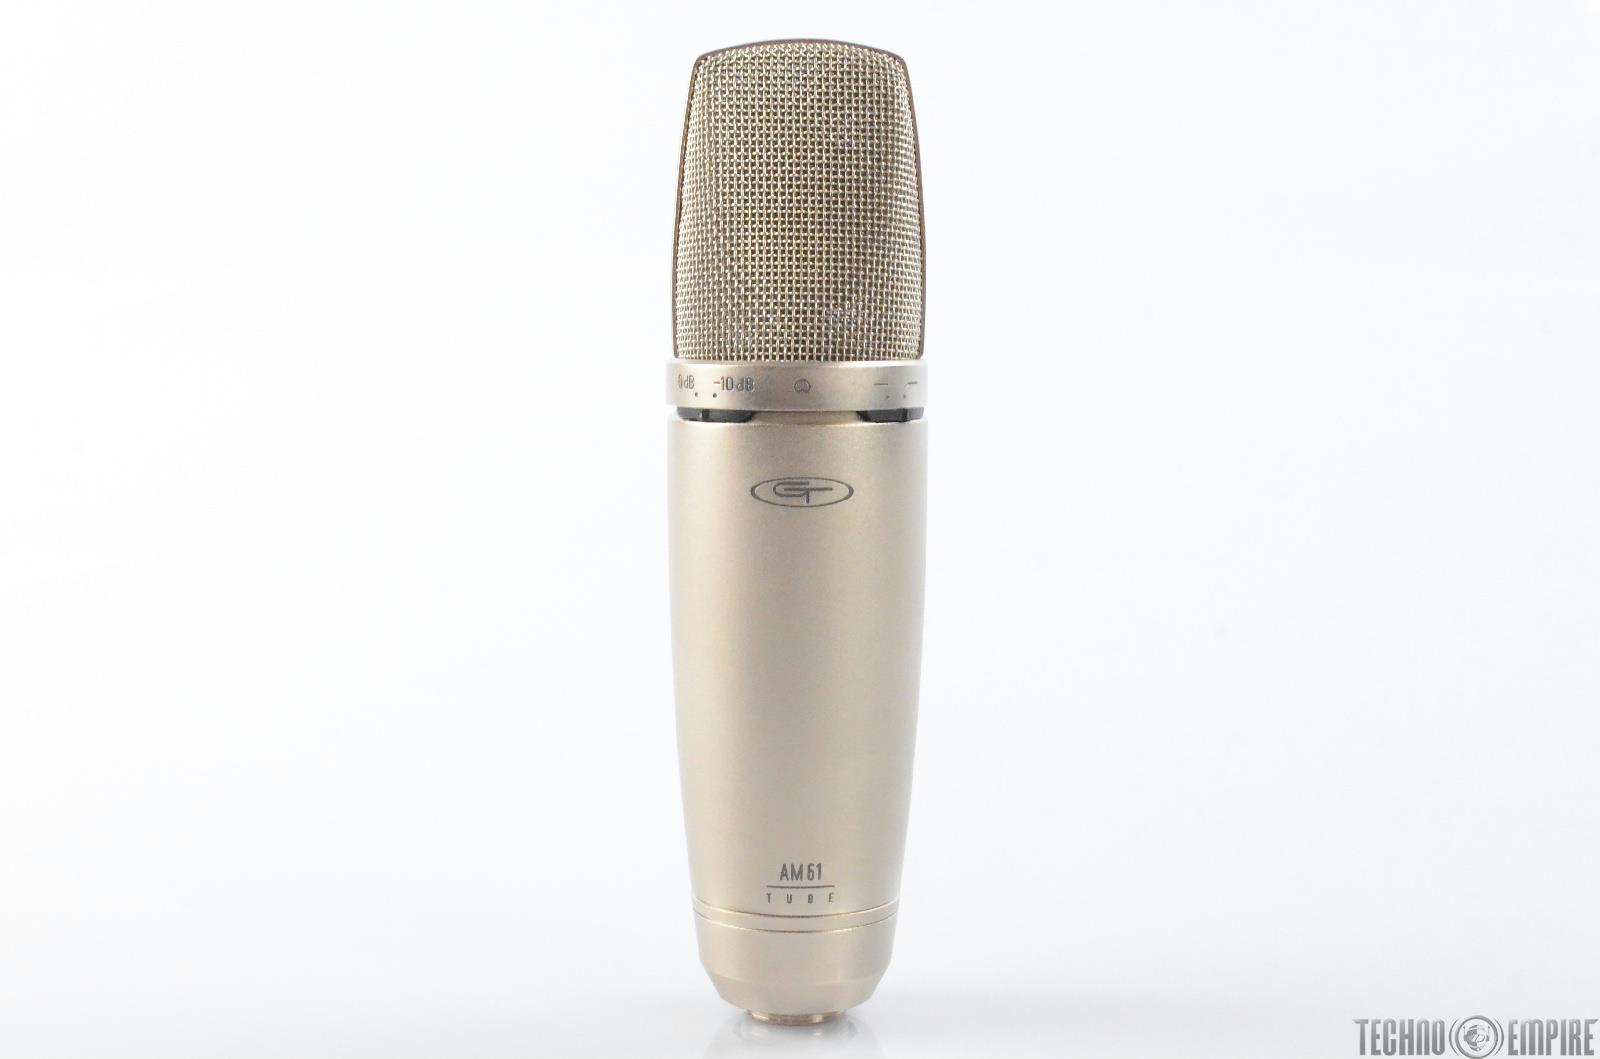 Alesis Groove Tubes GT AM61 Tube Condenser Microphone Studio Mic #28945